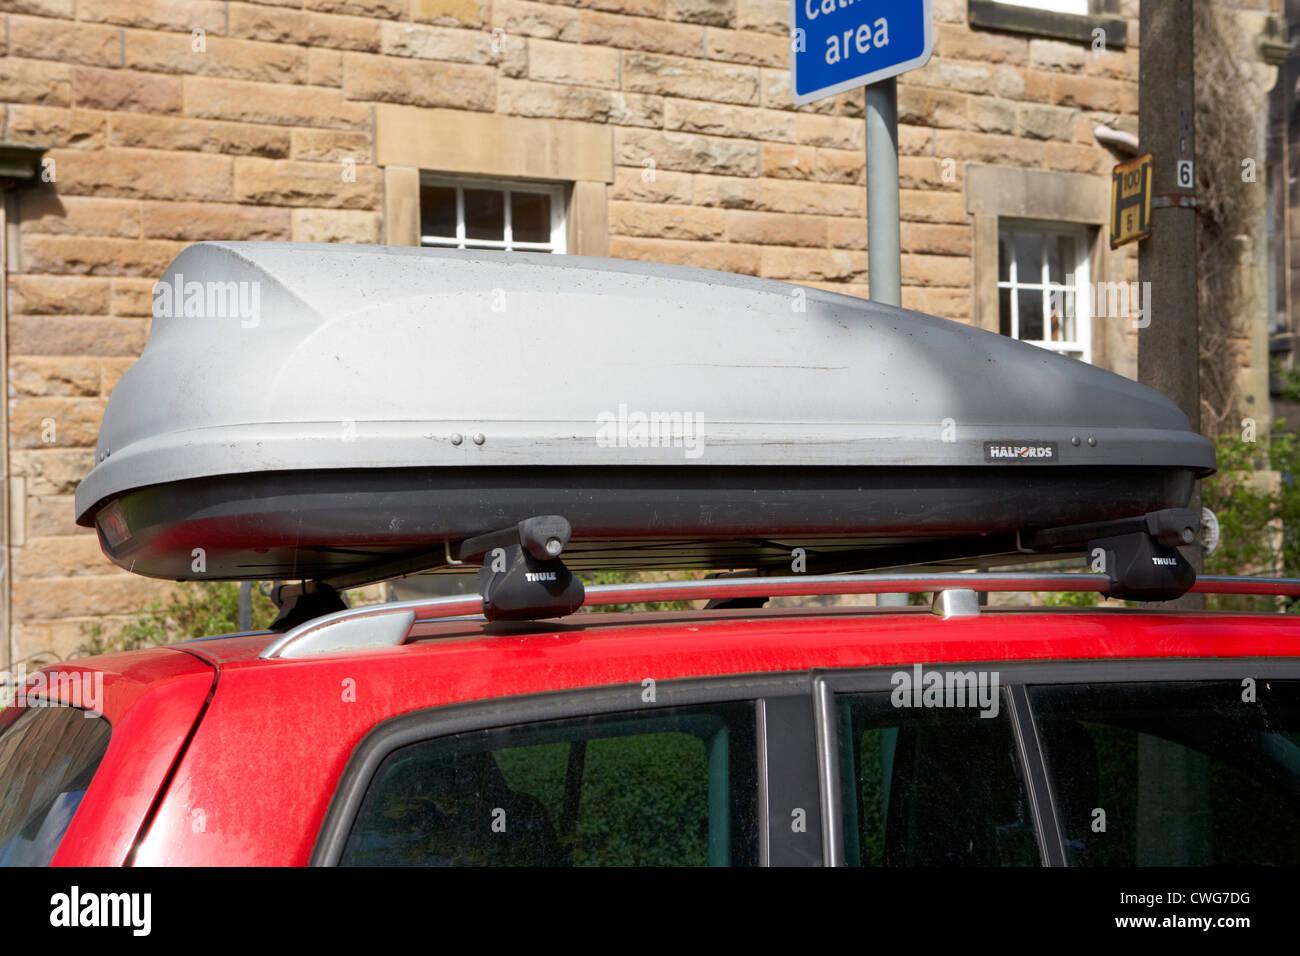 car storage roof box on roof rack on top of a car edinburgh scotland uk united kingdom & car storage roof box on roof rack on top of a car edinburgh Stock ...